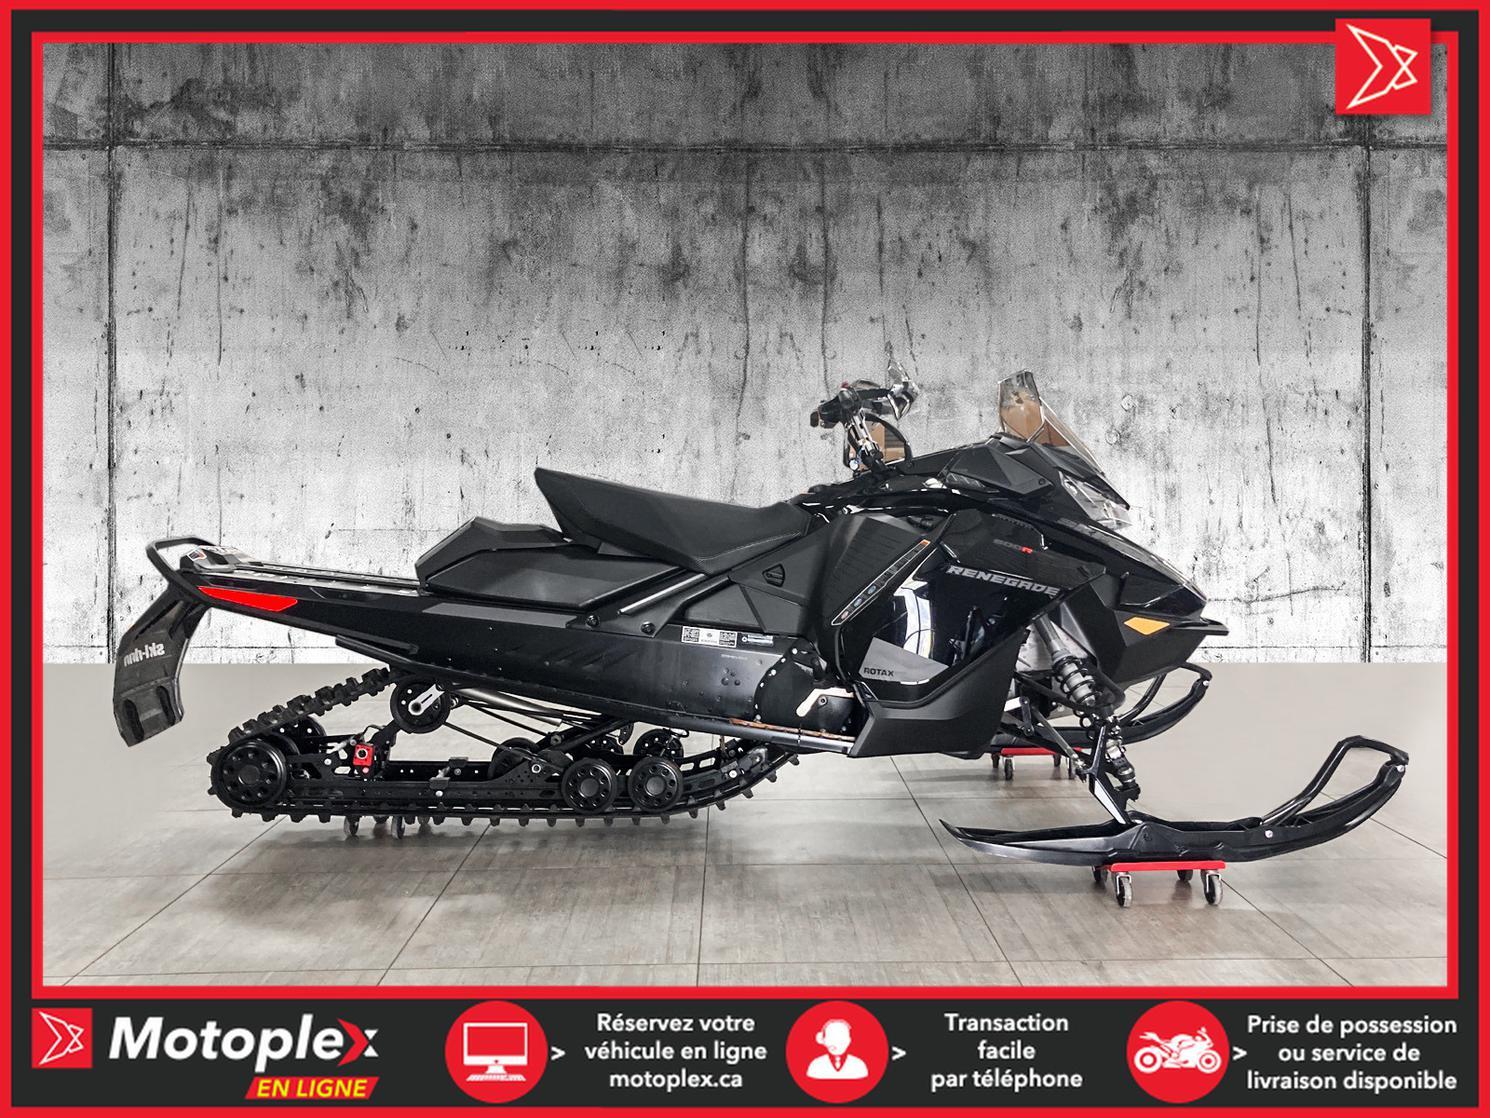 2021 Ski-Doo RENEGADE 600R E-TEC - 46$/SEMAINE